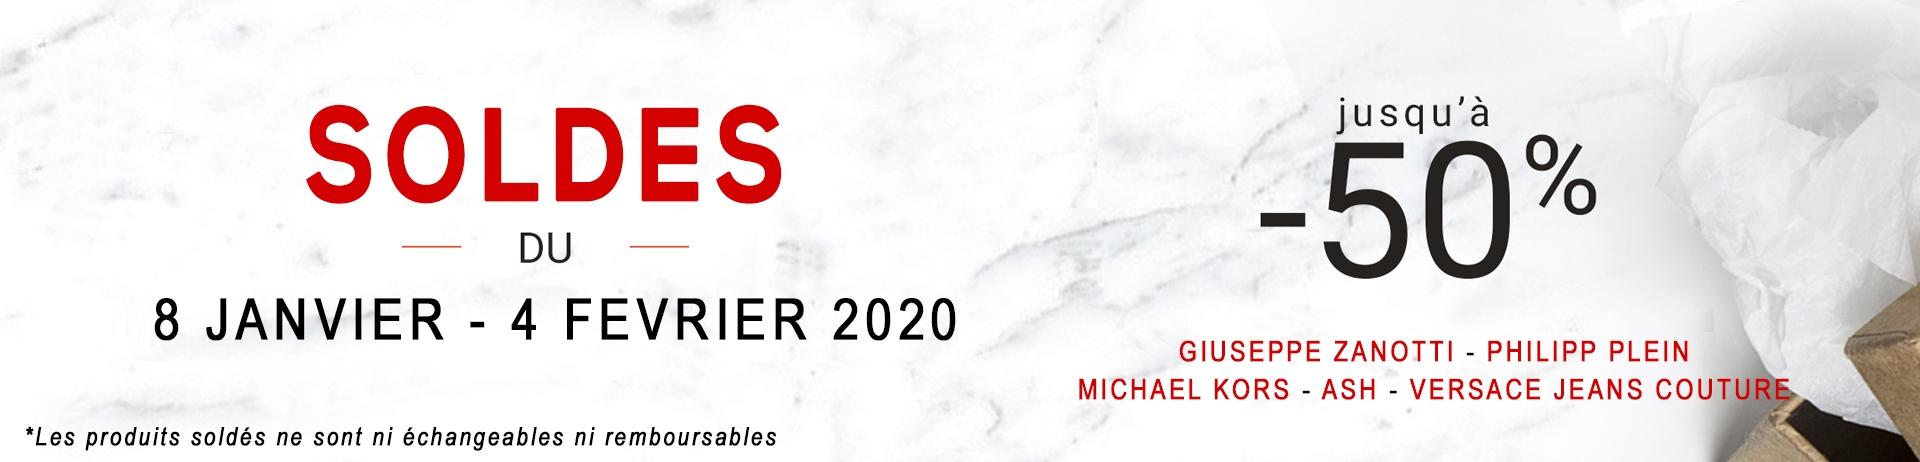 SOLDES JANVIER 2020